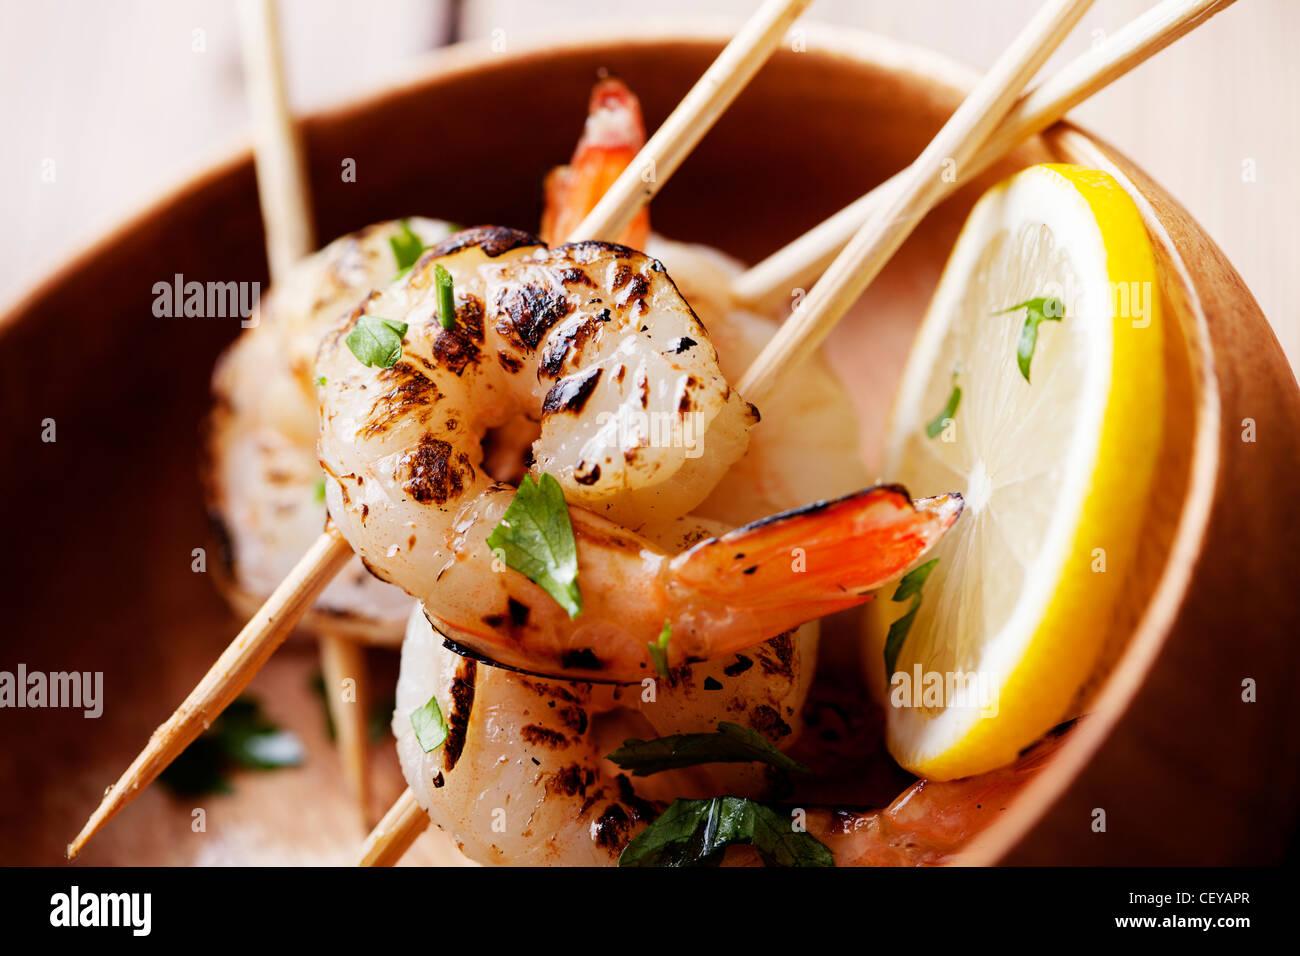 fresh grilled shrimps close up - Stock Image